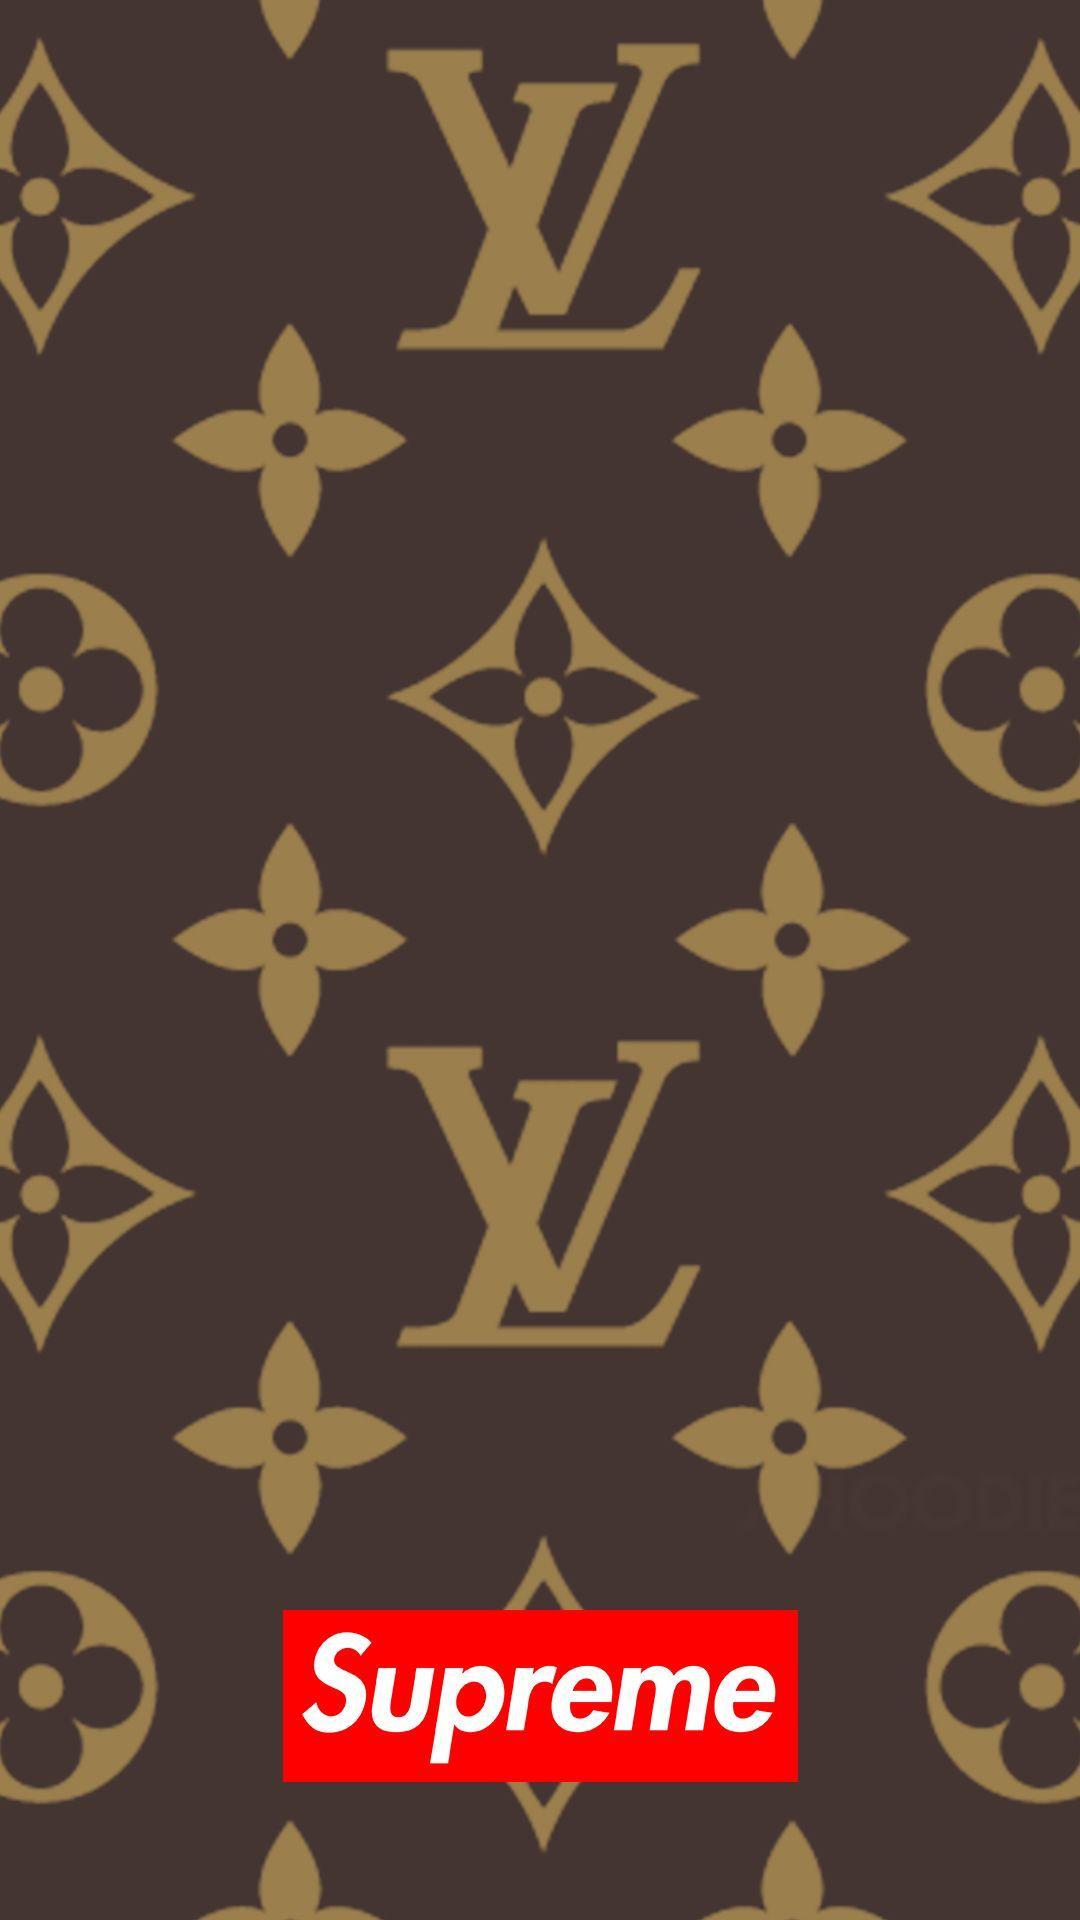 e621db4a1f1 Louis Vuitton Wallpapers - Wallpaper Cave